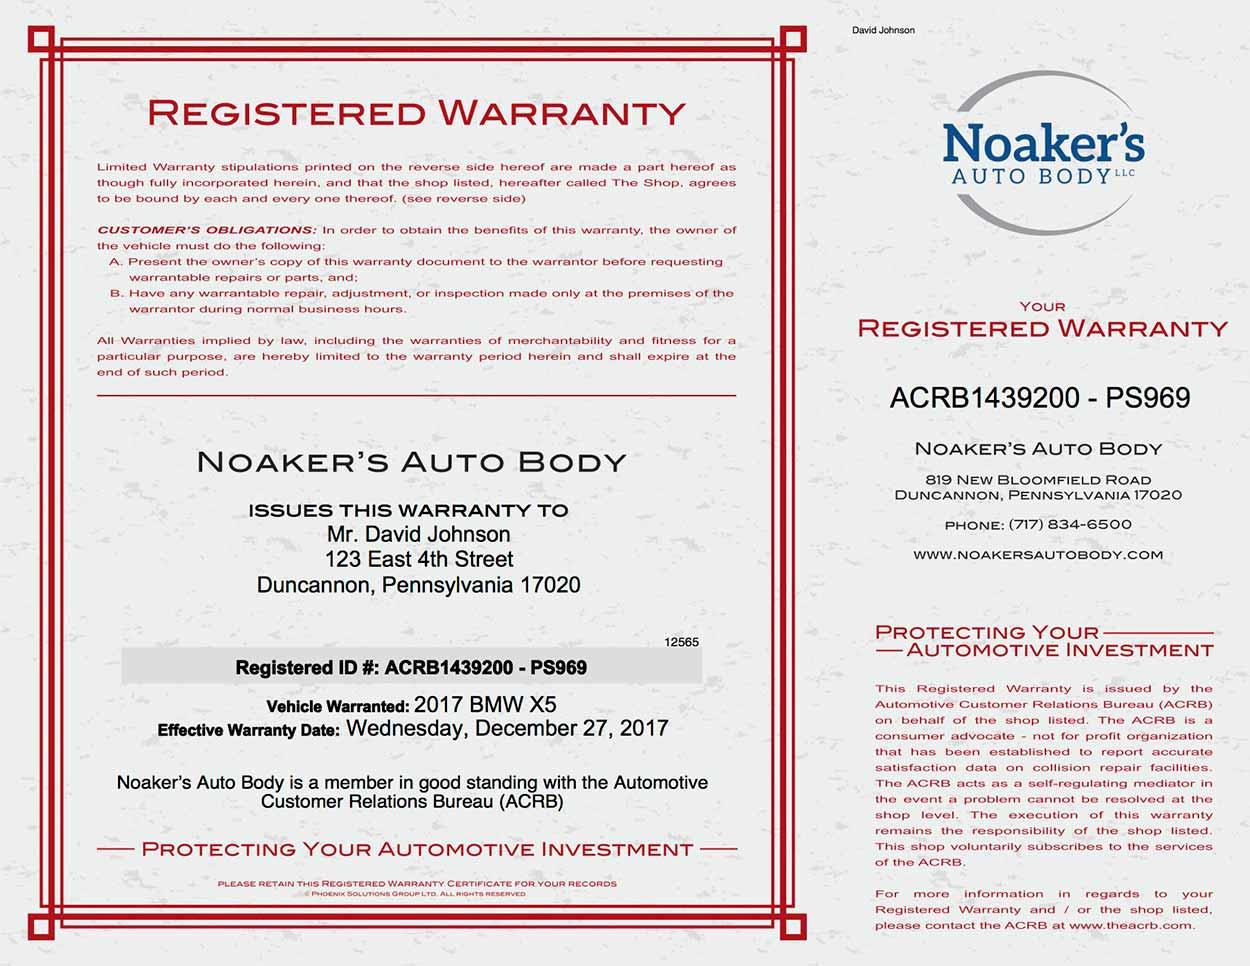 Noaker's Collision Warranty